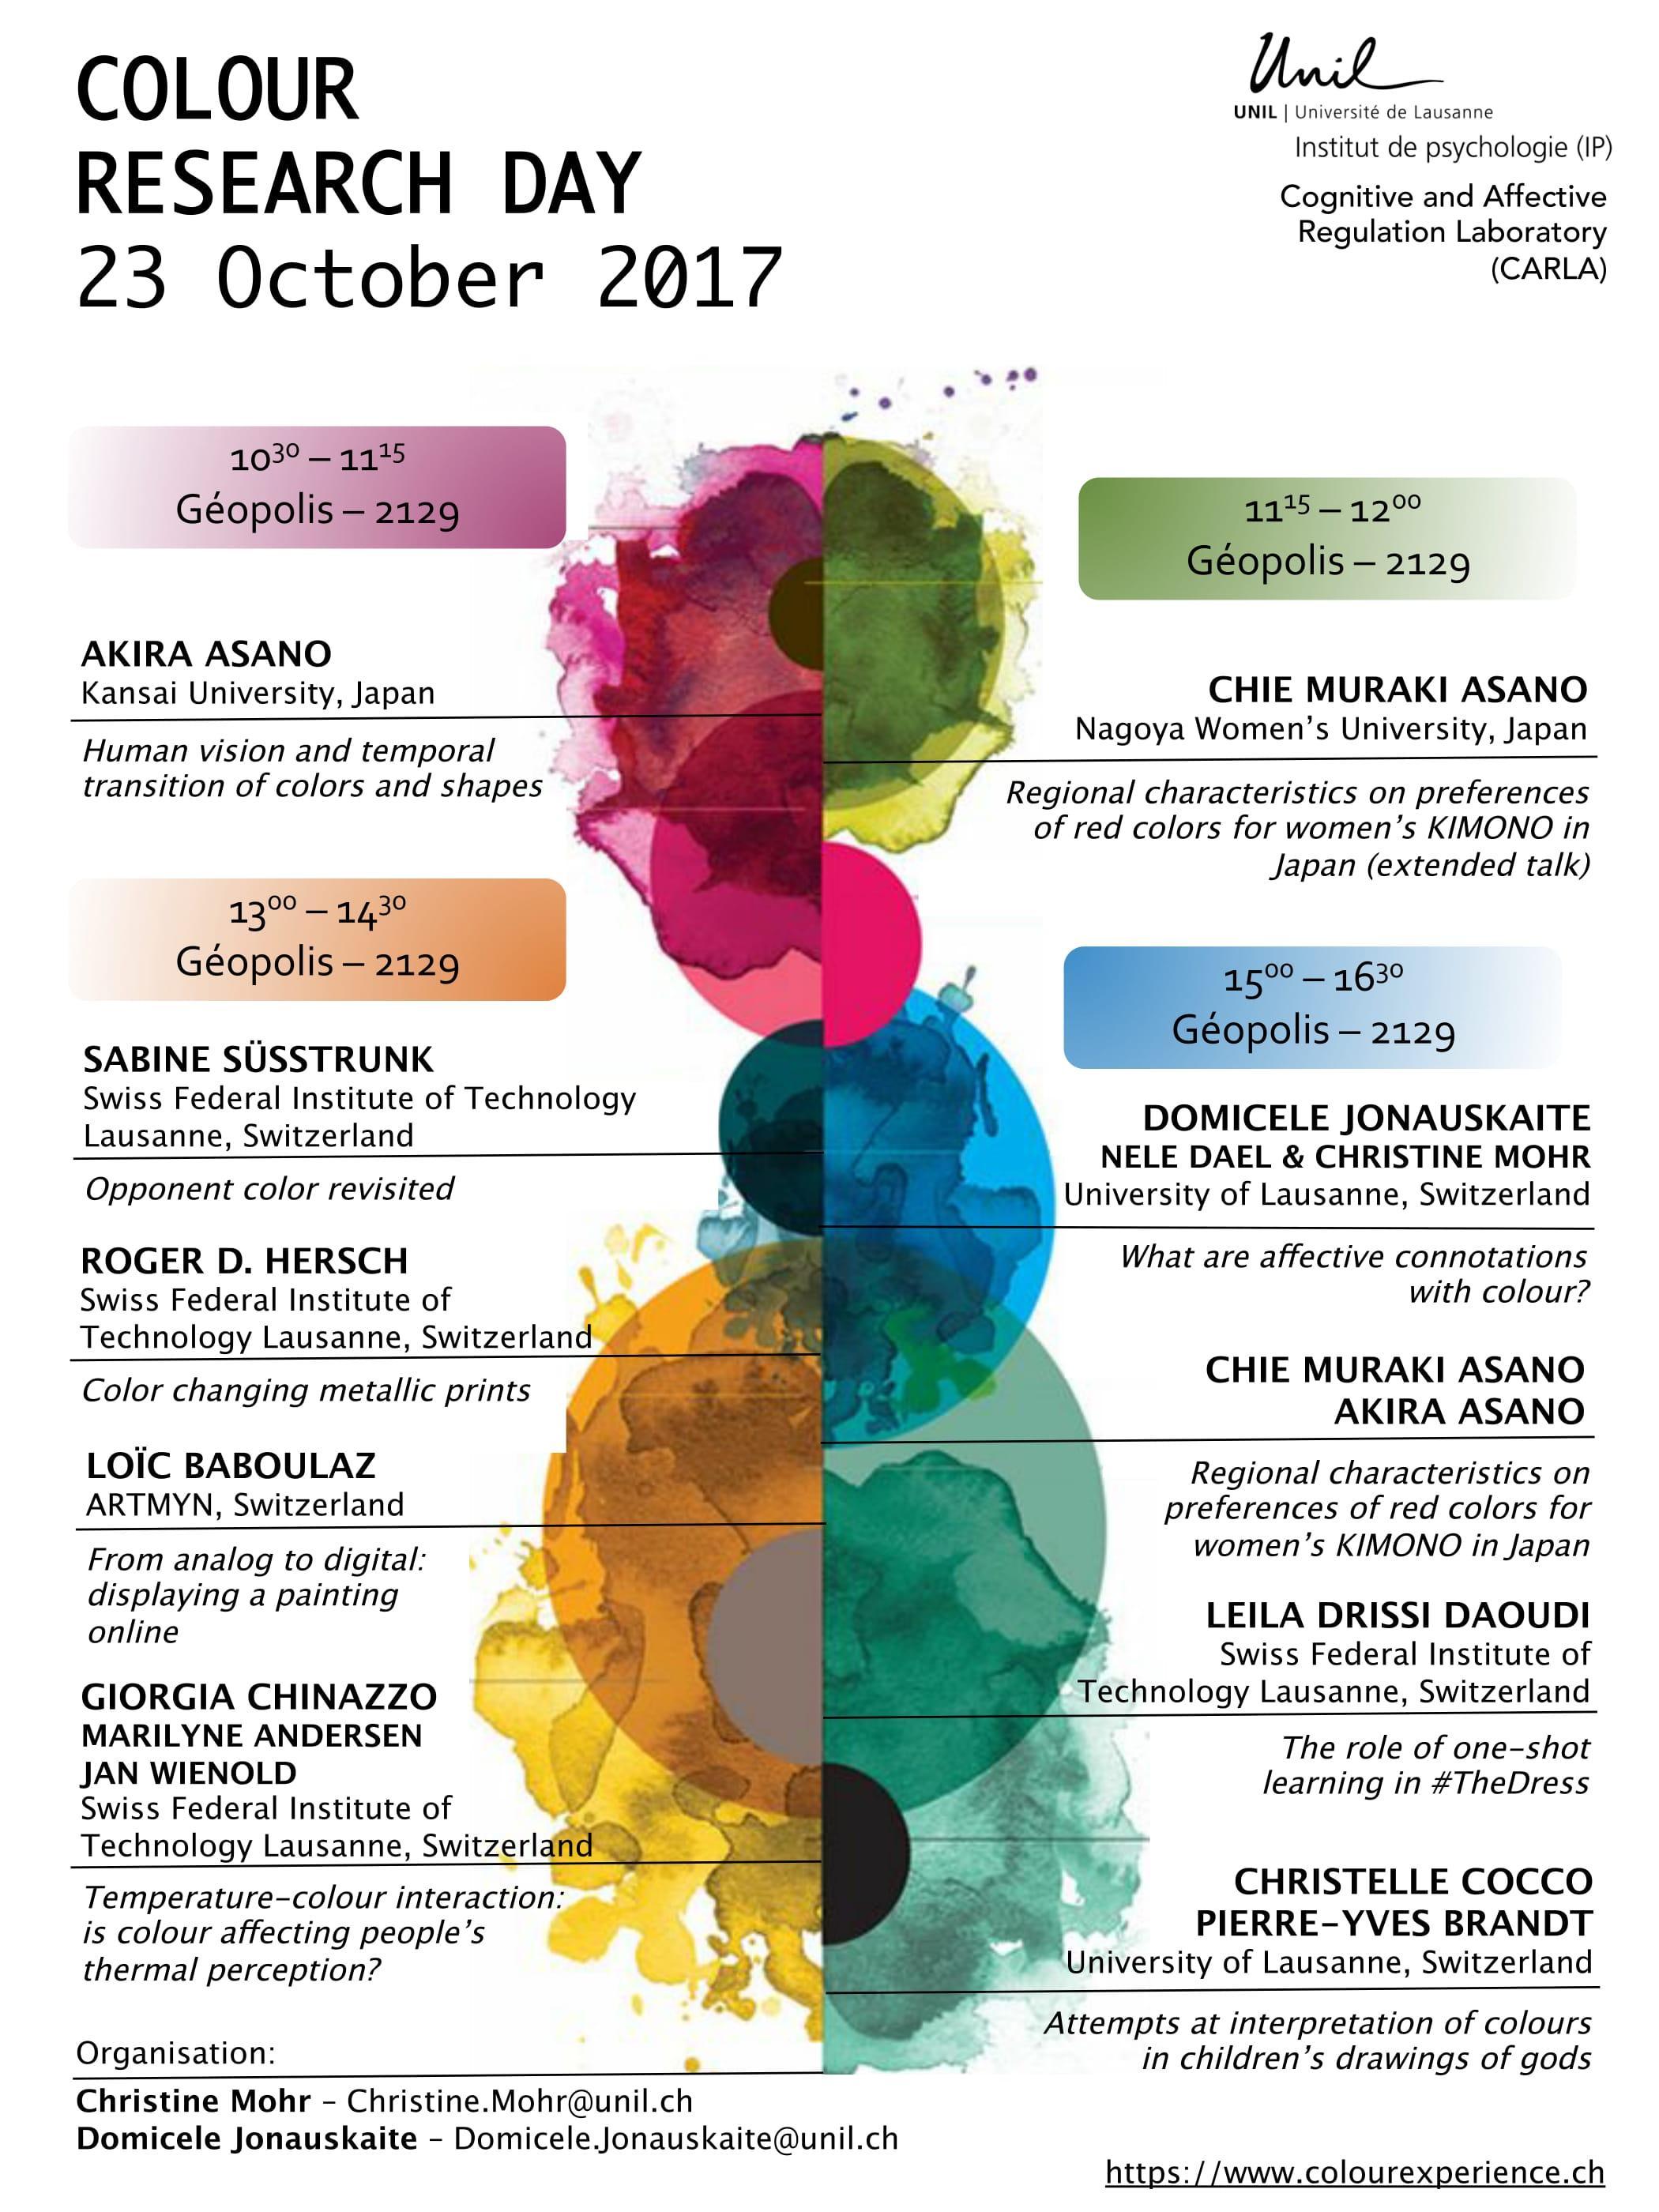 Colour Research Day 2017 program